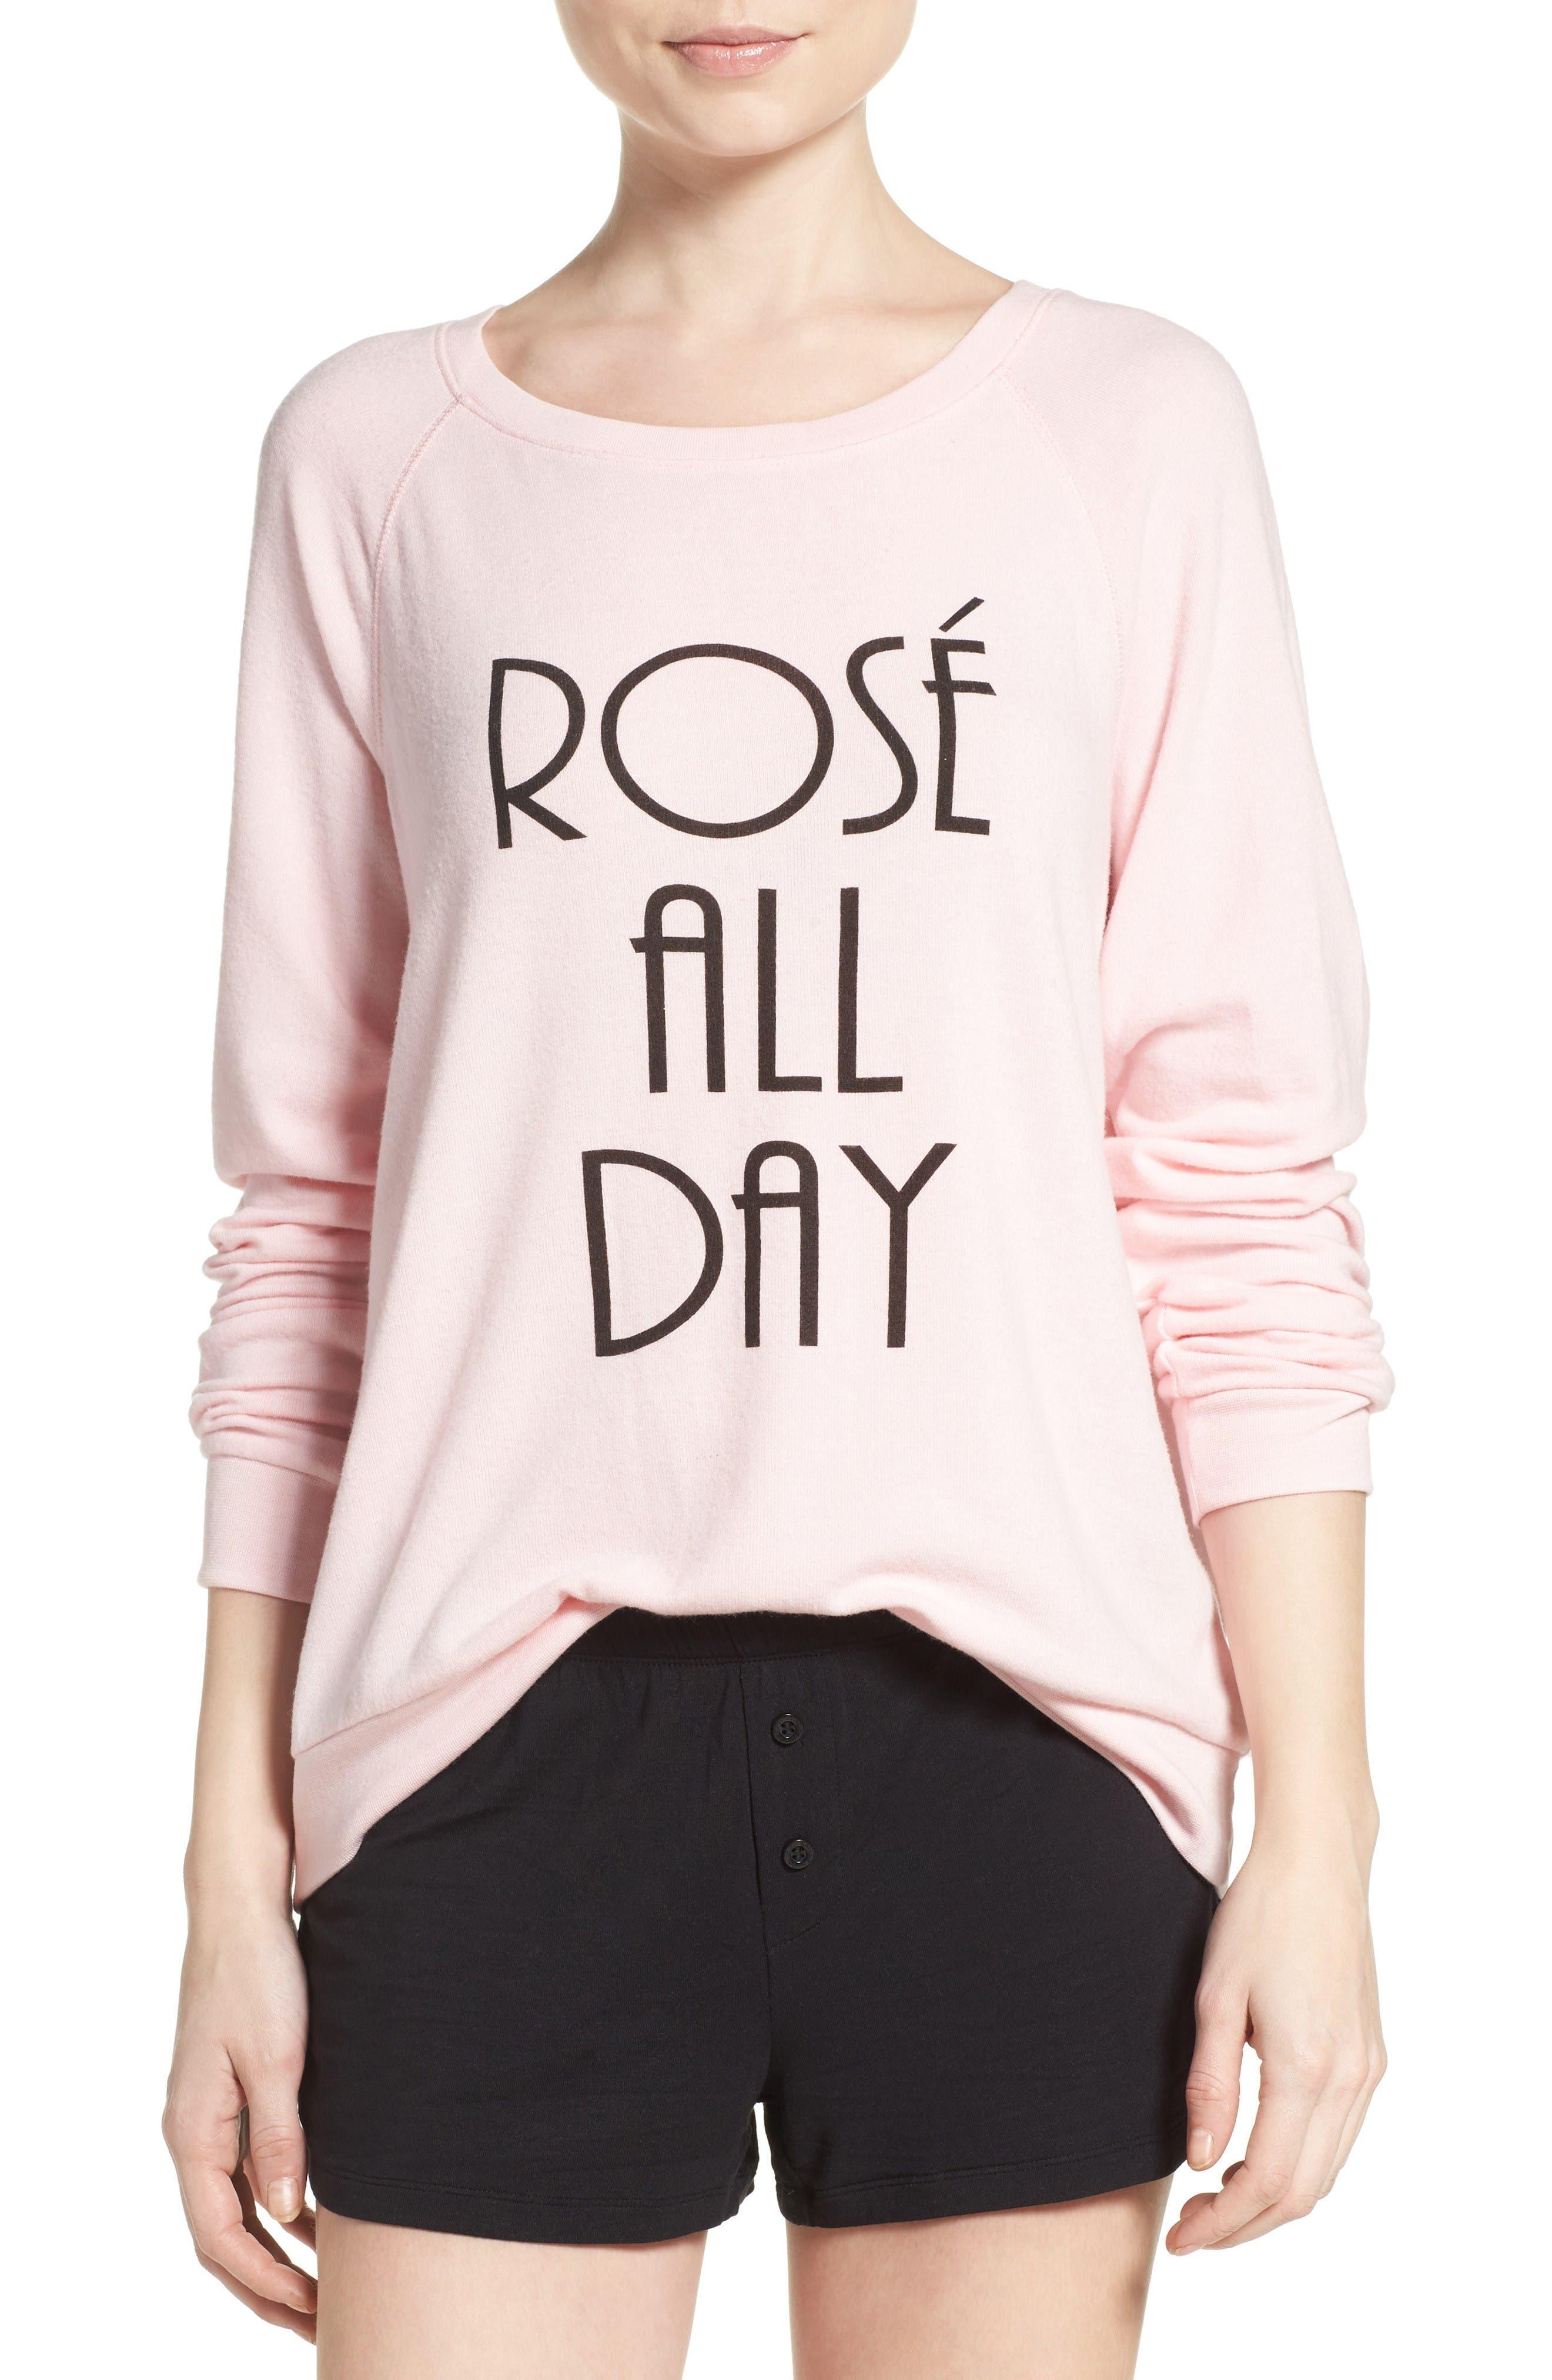 Alternate Image 1 Selected - PJ Salvage Rosé All Day Sweatshirt